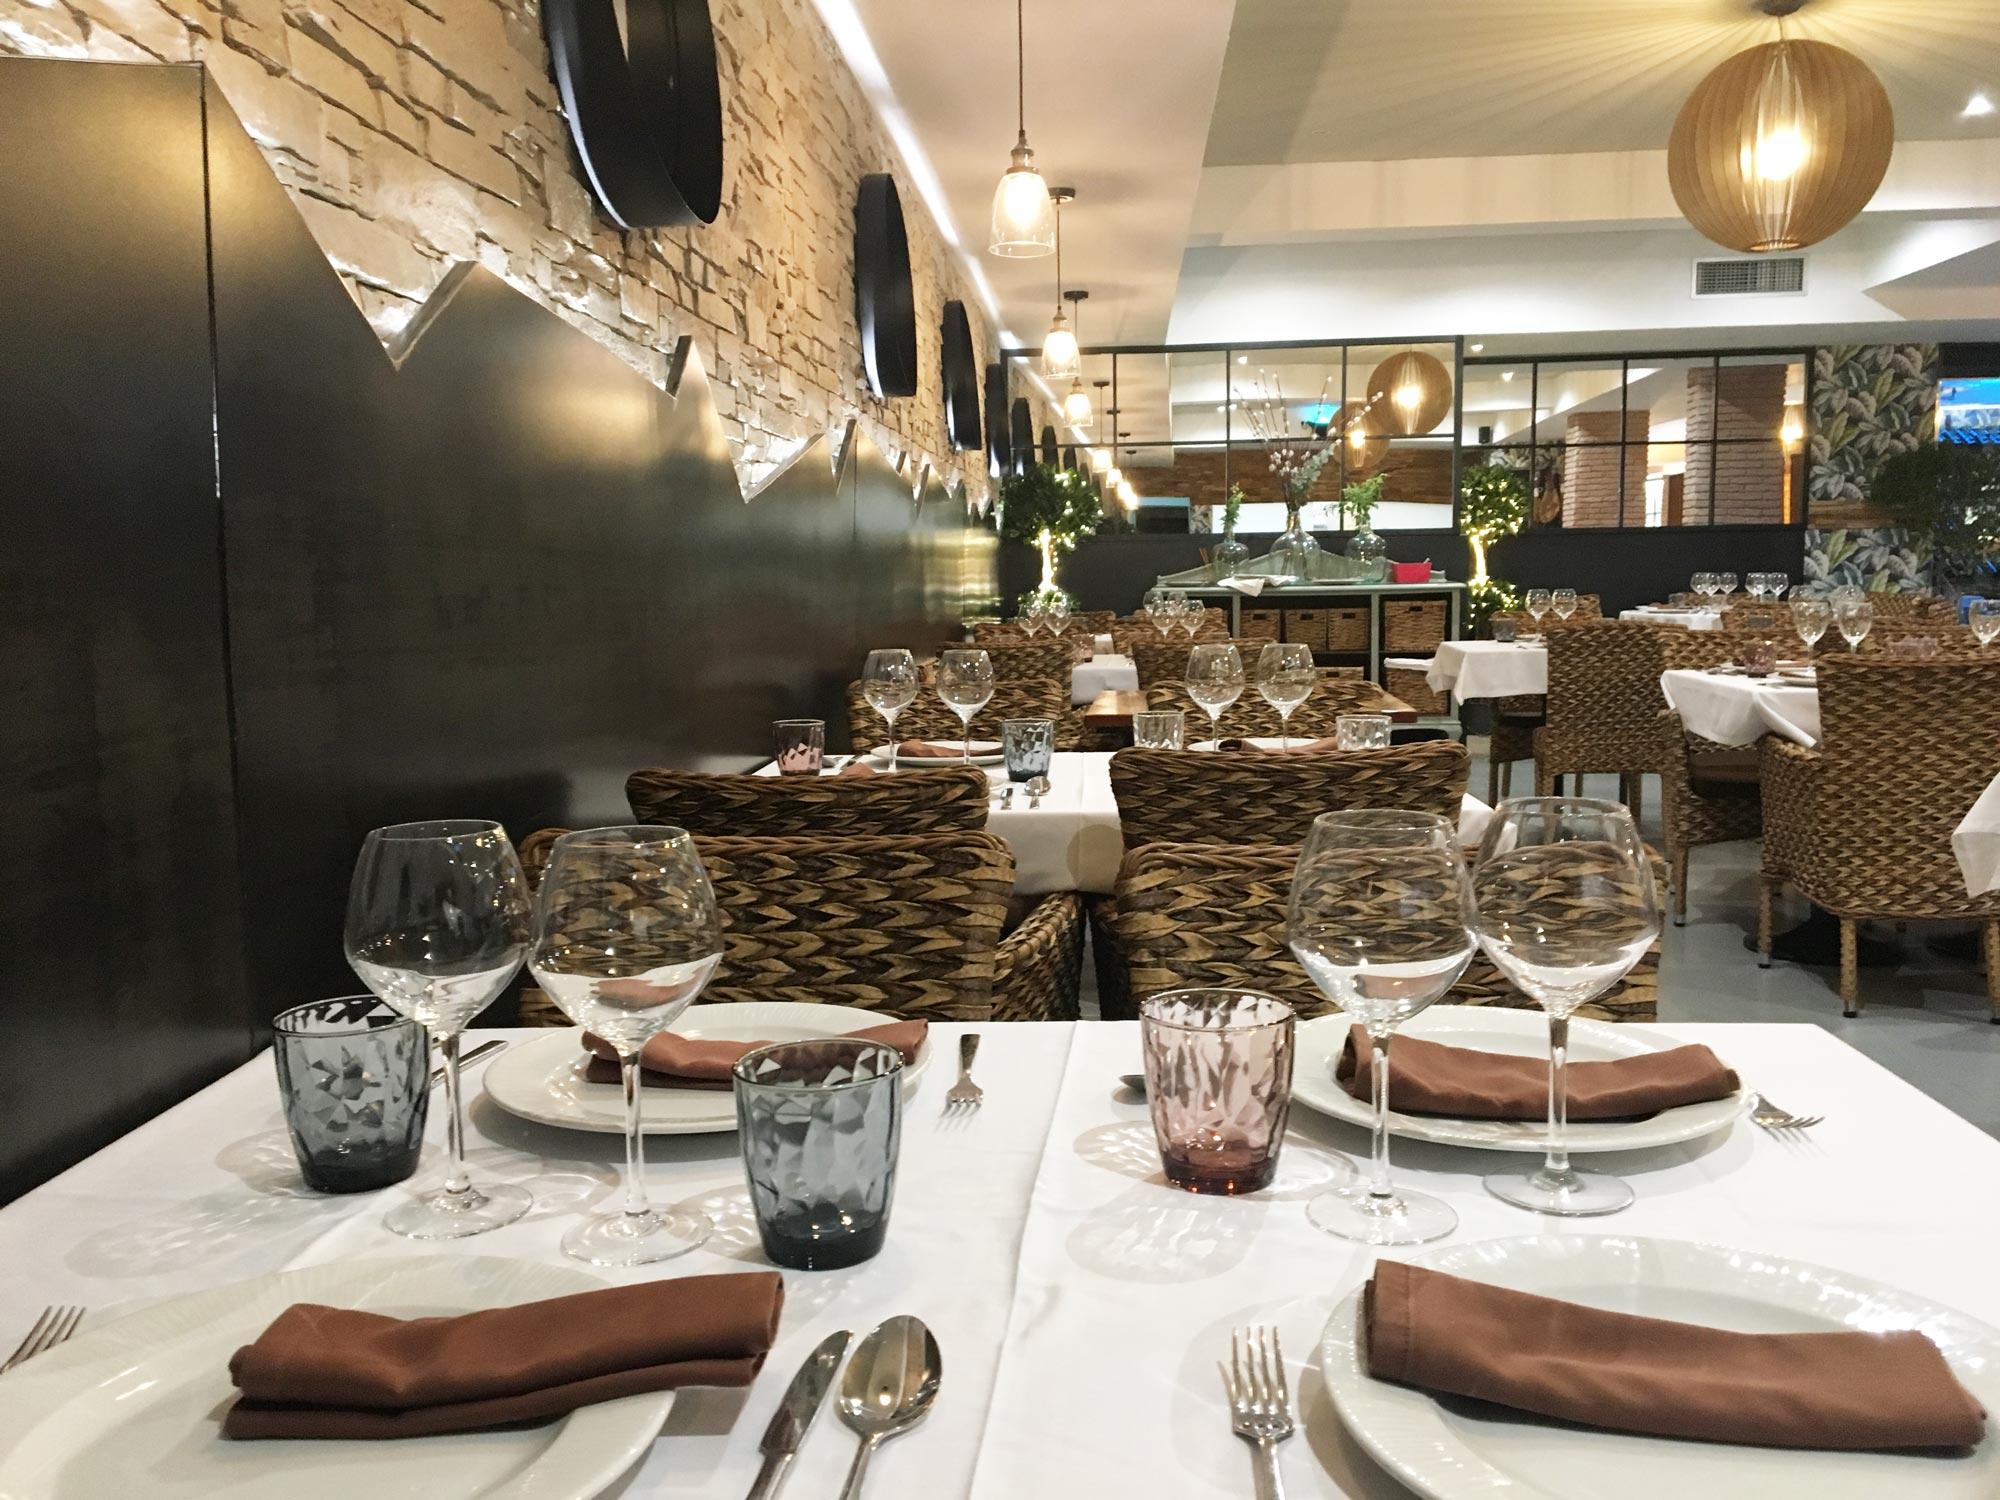 Restaurante-Lucrecia-Alcala-Mesas-Bajas